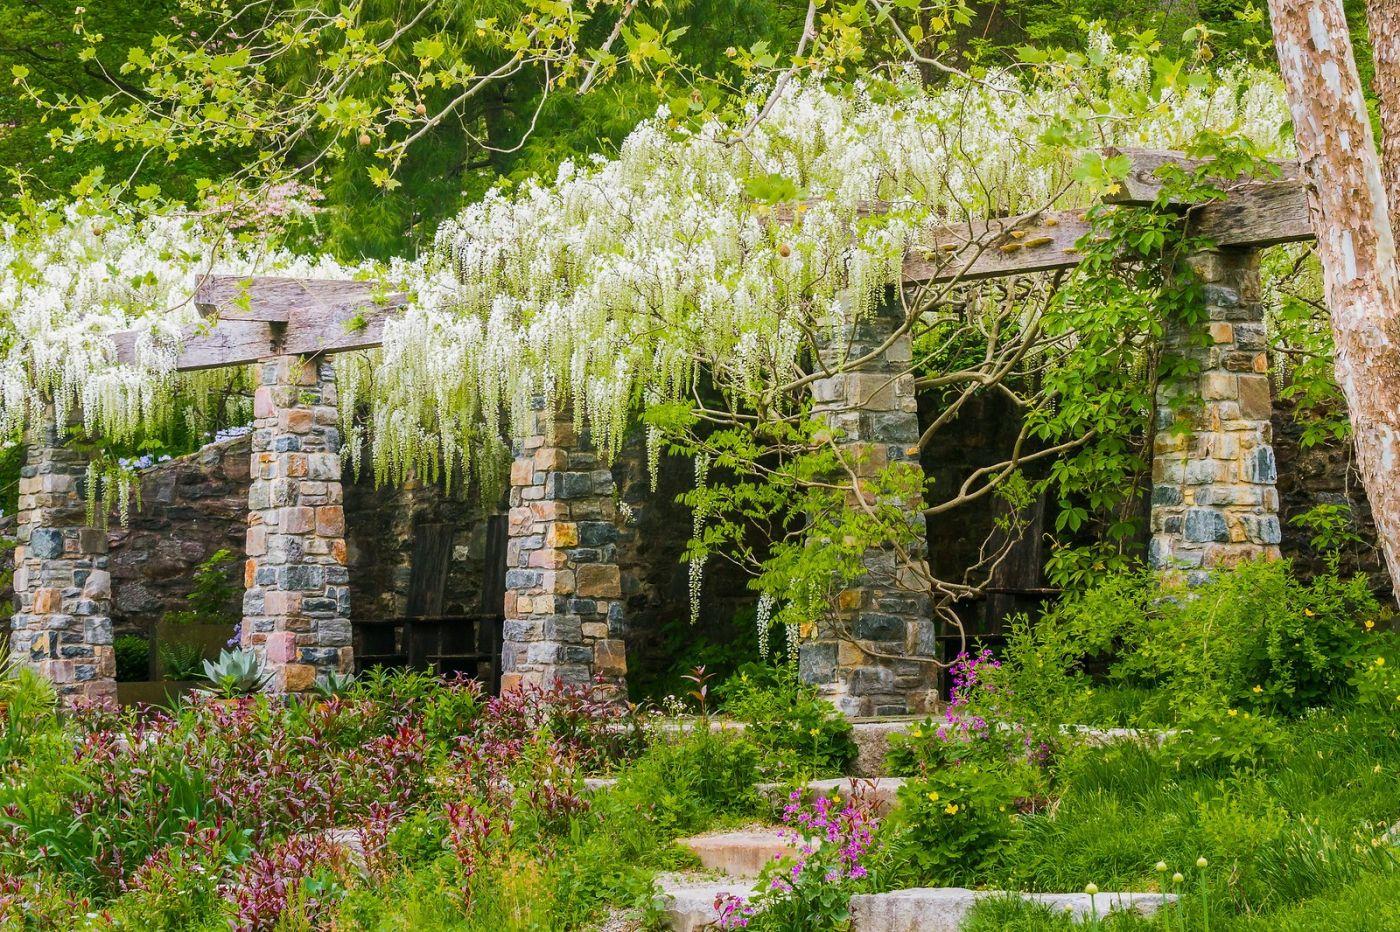 Chanticleer花园,那年盛开的紫藤花_图1-29